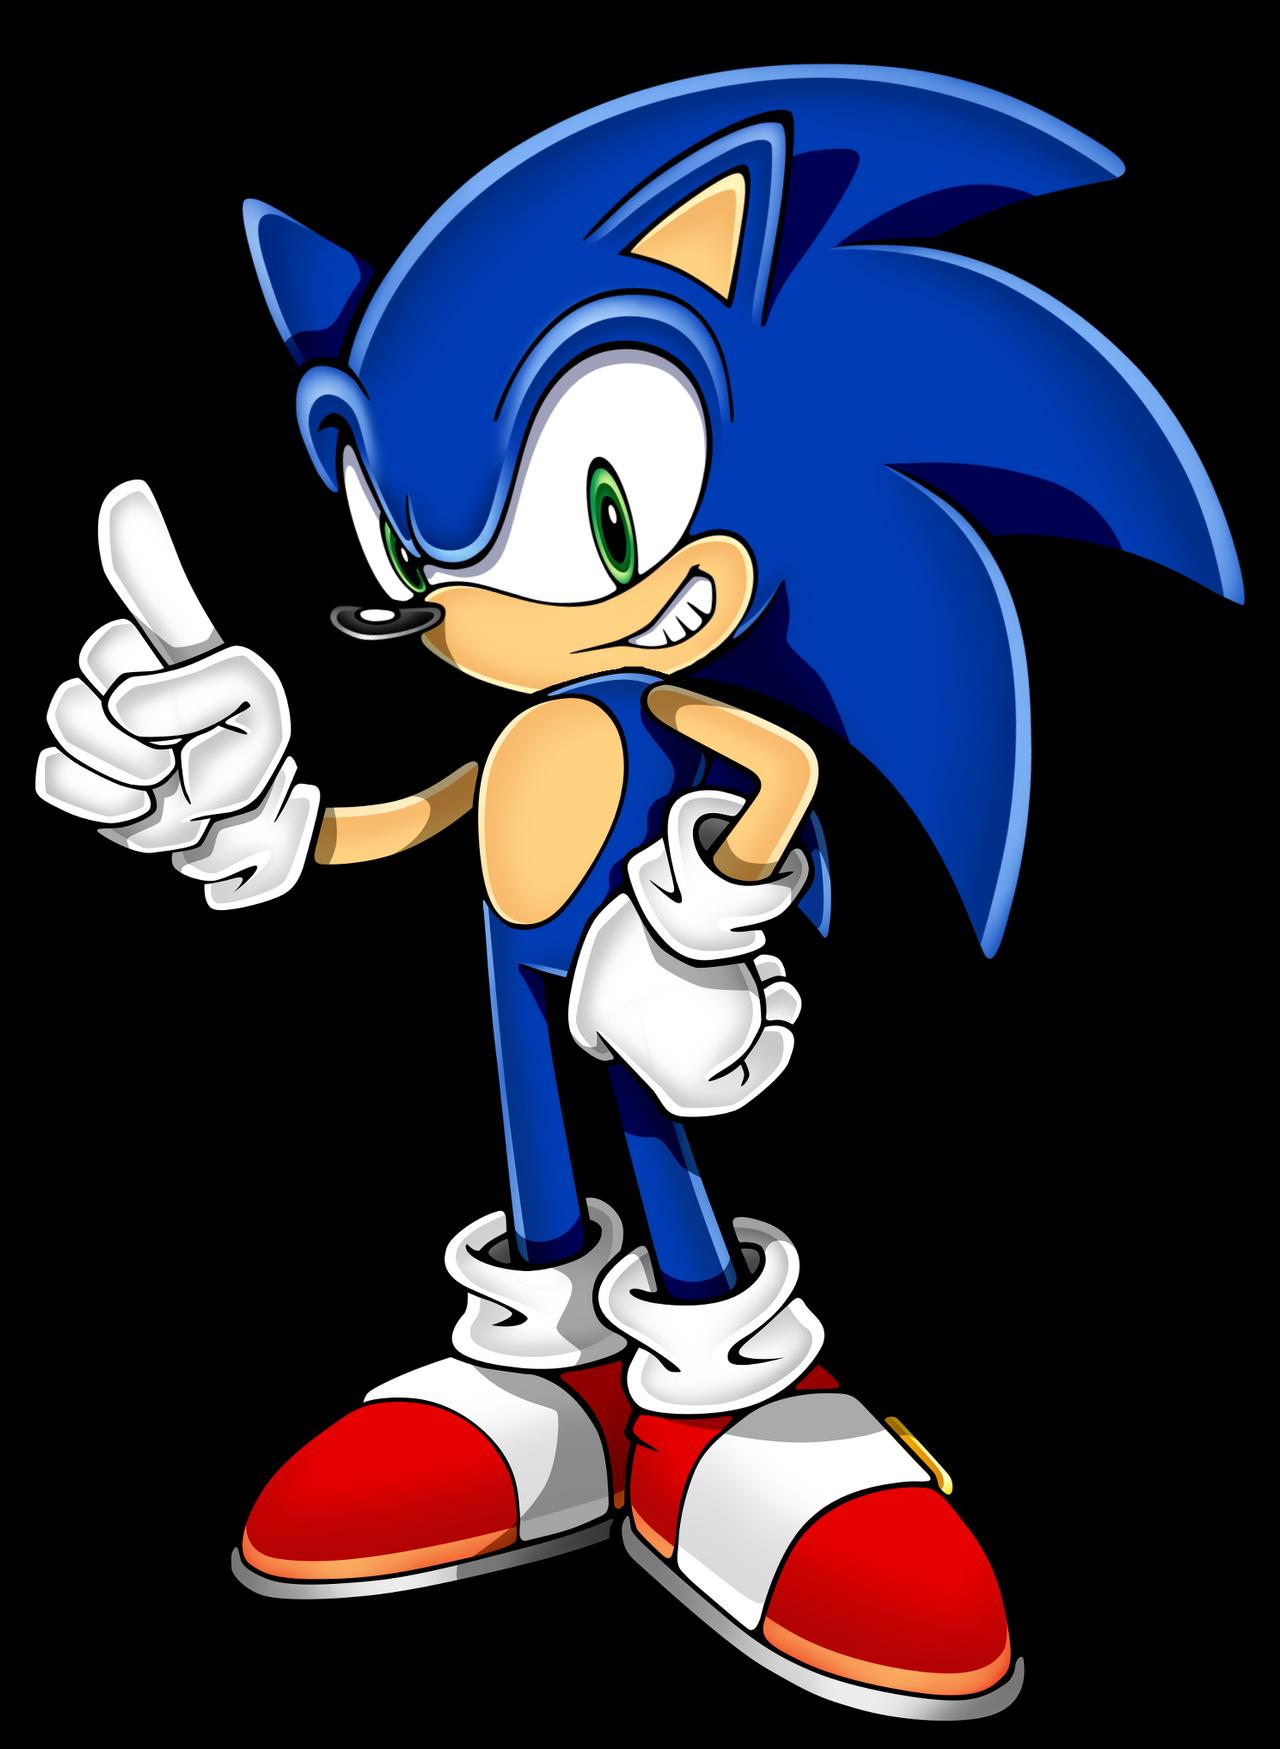 Sonic The Hedgehog Dreamcast Artstyle By Lachlandingoofficial On Deviantart